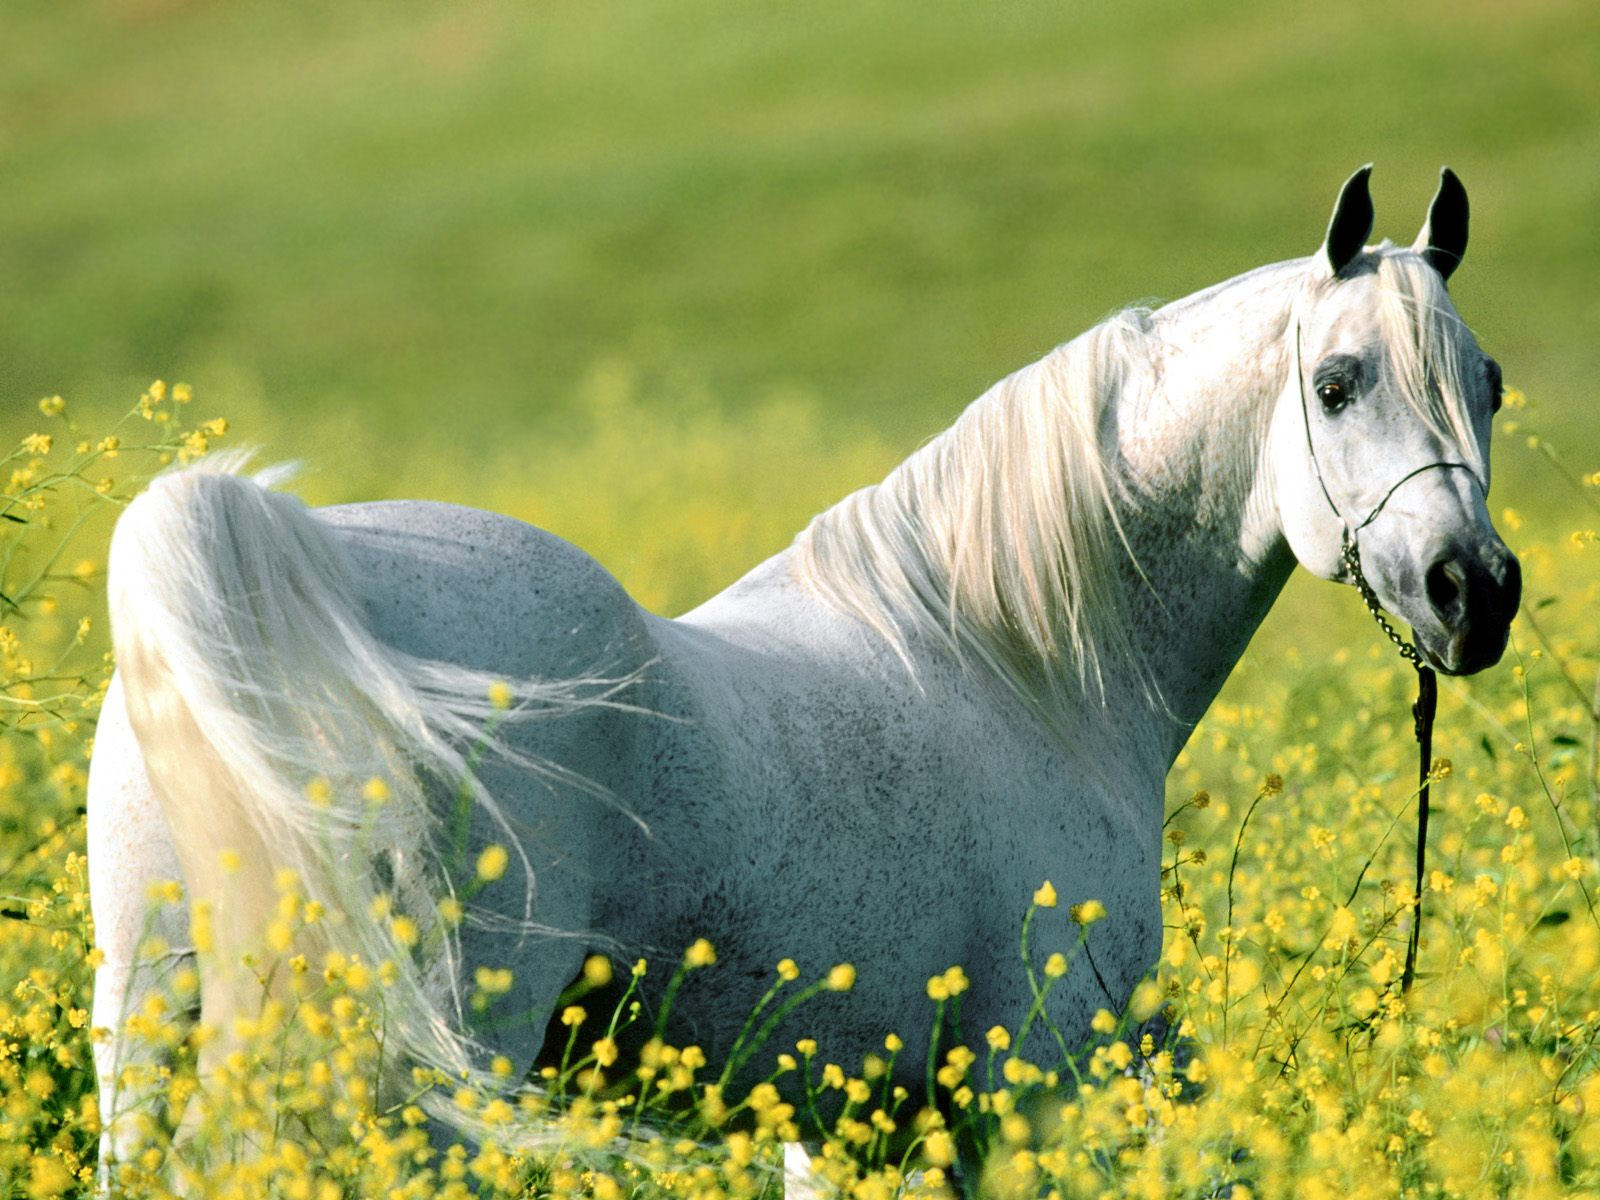 Horse Wallpapers Wild Horses Photos Animal Photo 1600x1200